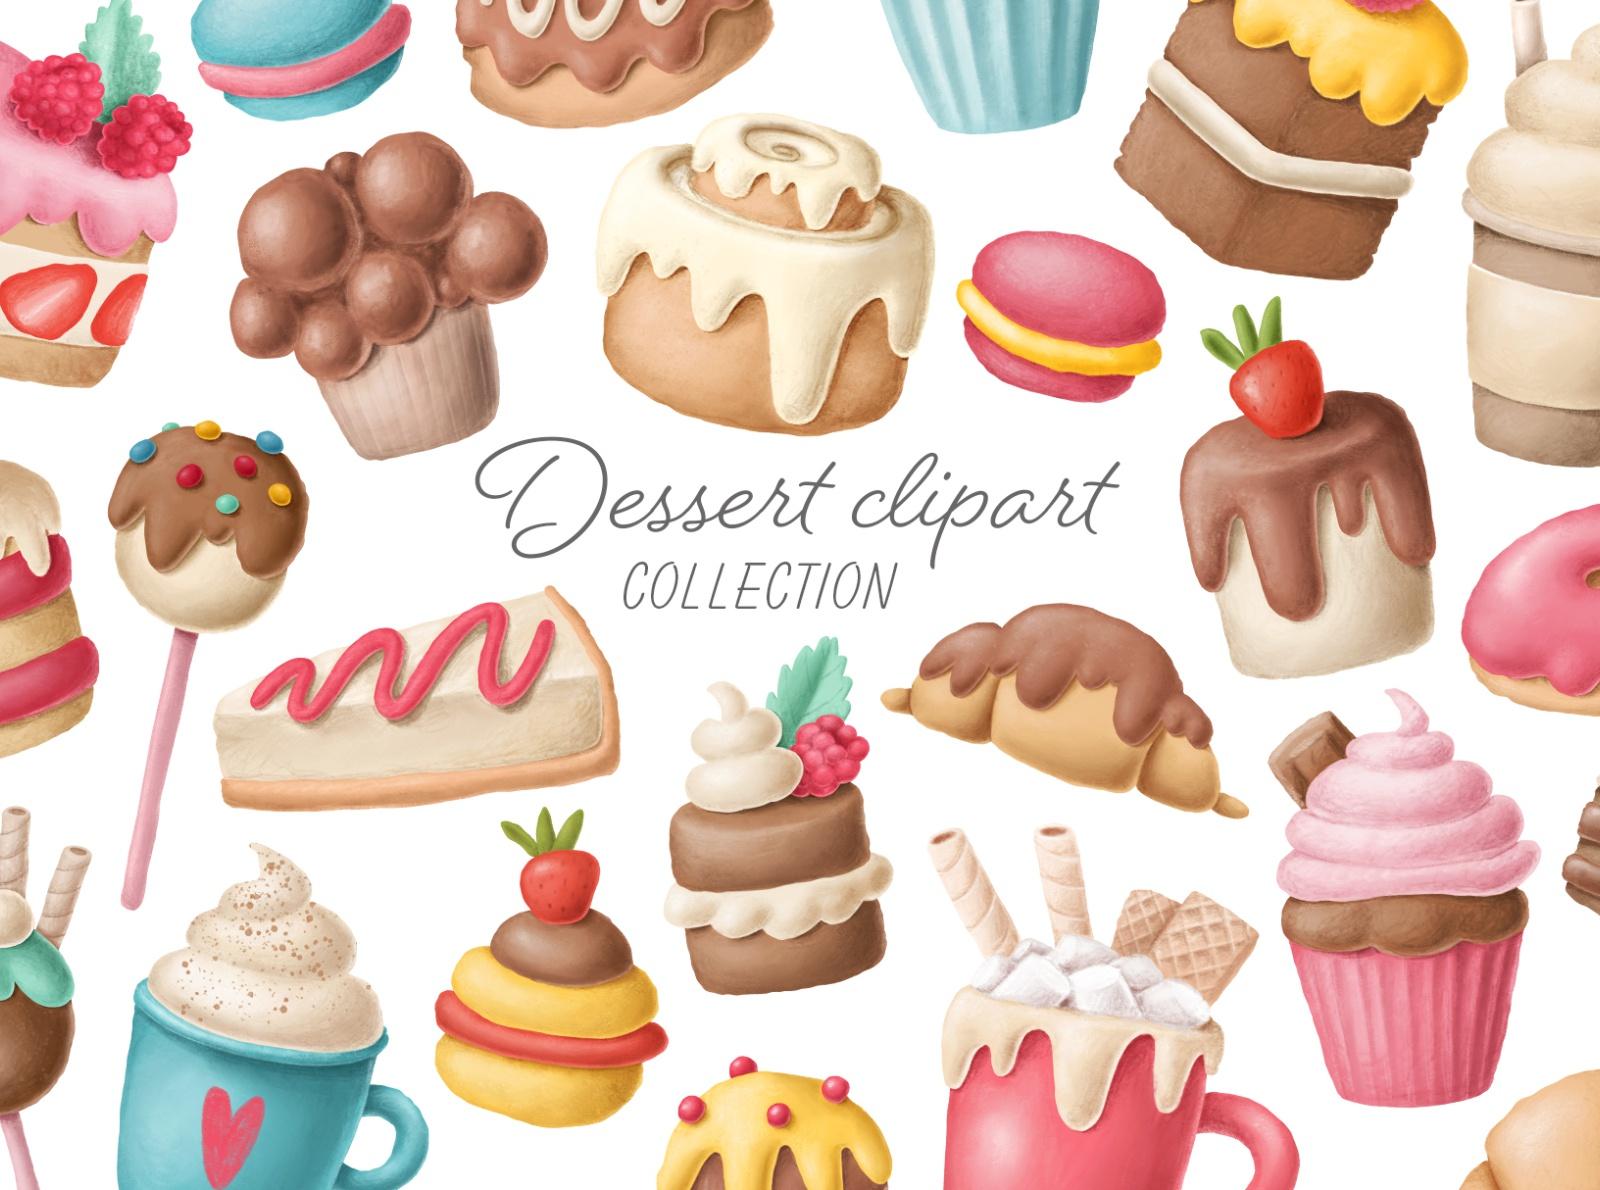 dessert clipart by Anastasiya Klempach on Dribbble.